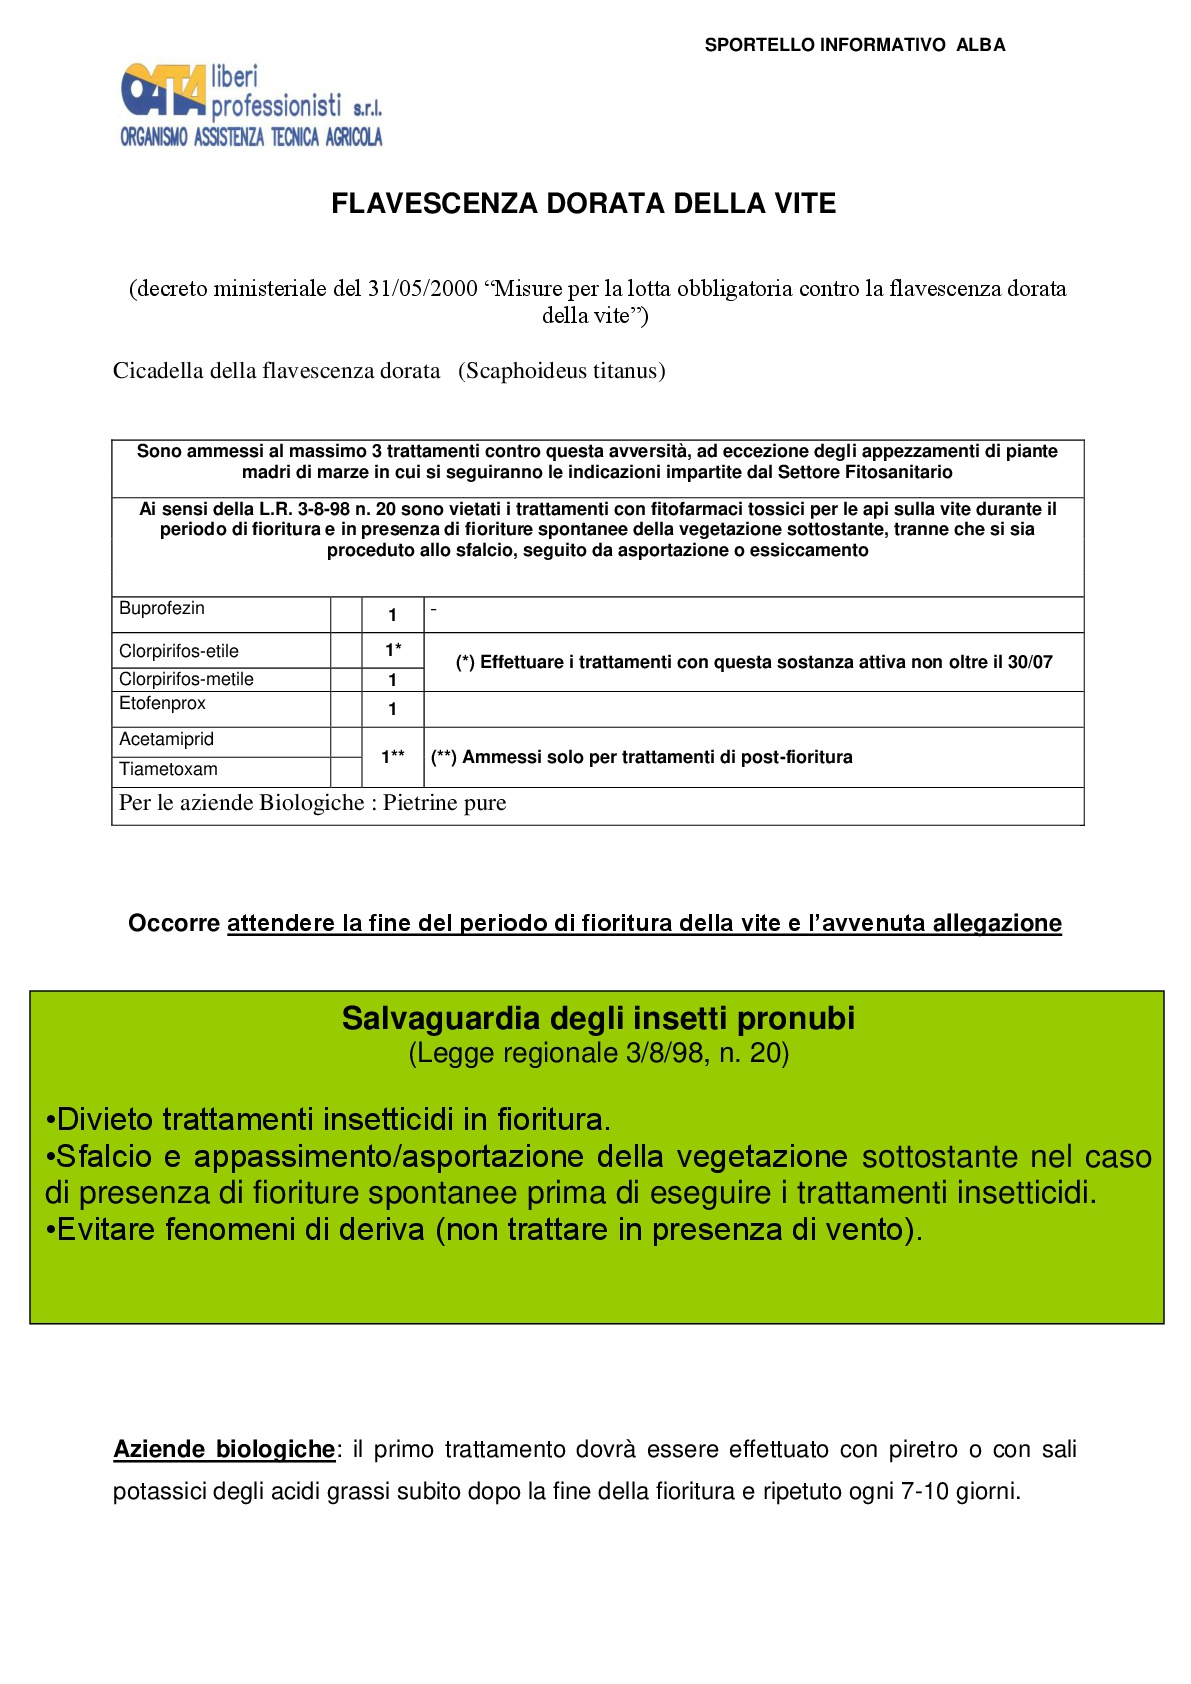 bollettino-vite-6-2017-002